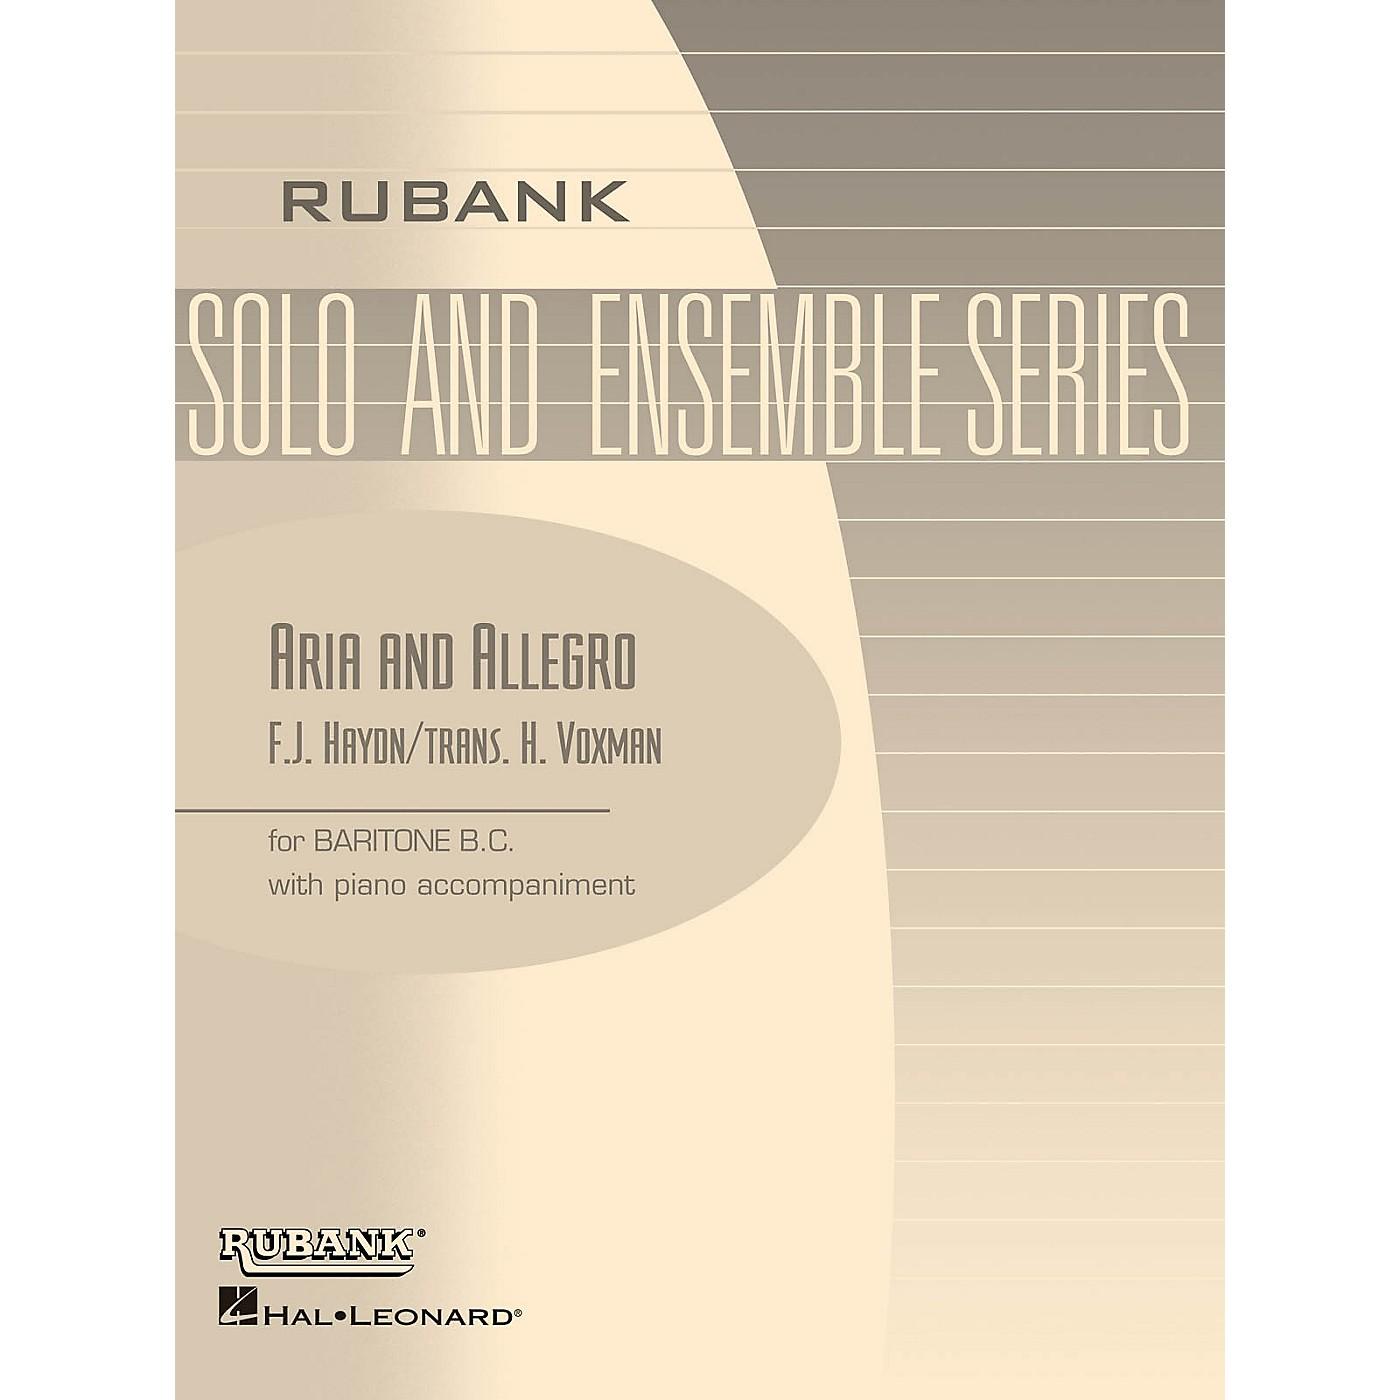 Rubank Publications Aria and Allegro (Baritone B.C. Solo with Piano - Grade 3) Rubank Solo/Ensemble Sheet Series thumbnail